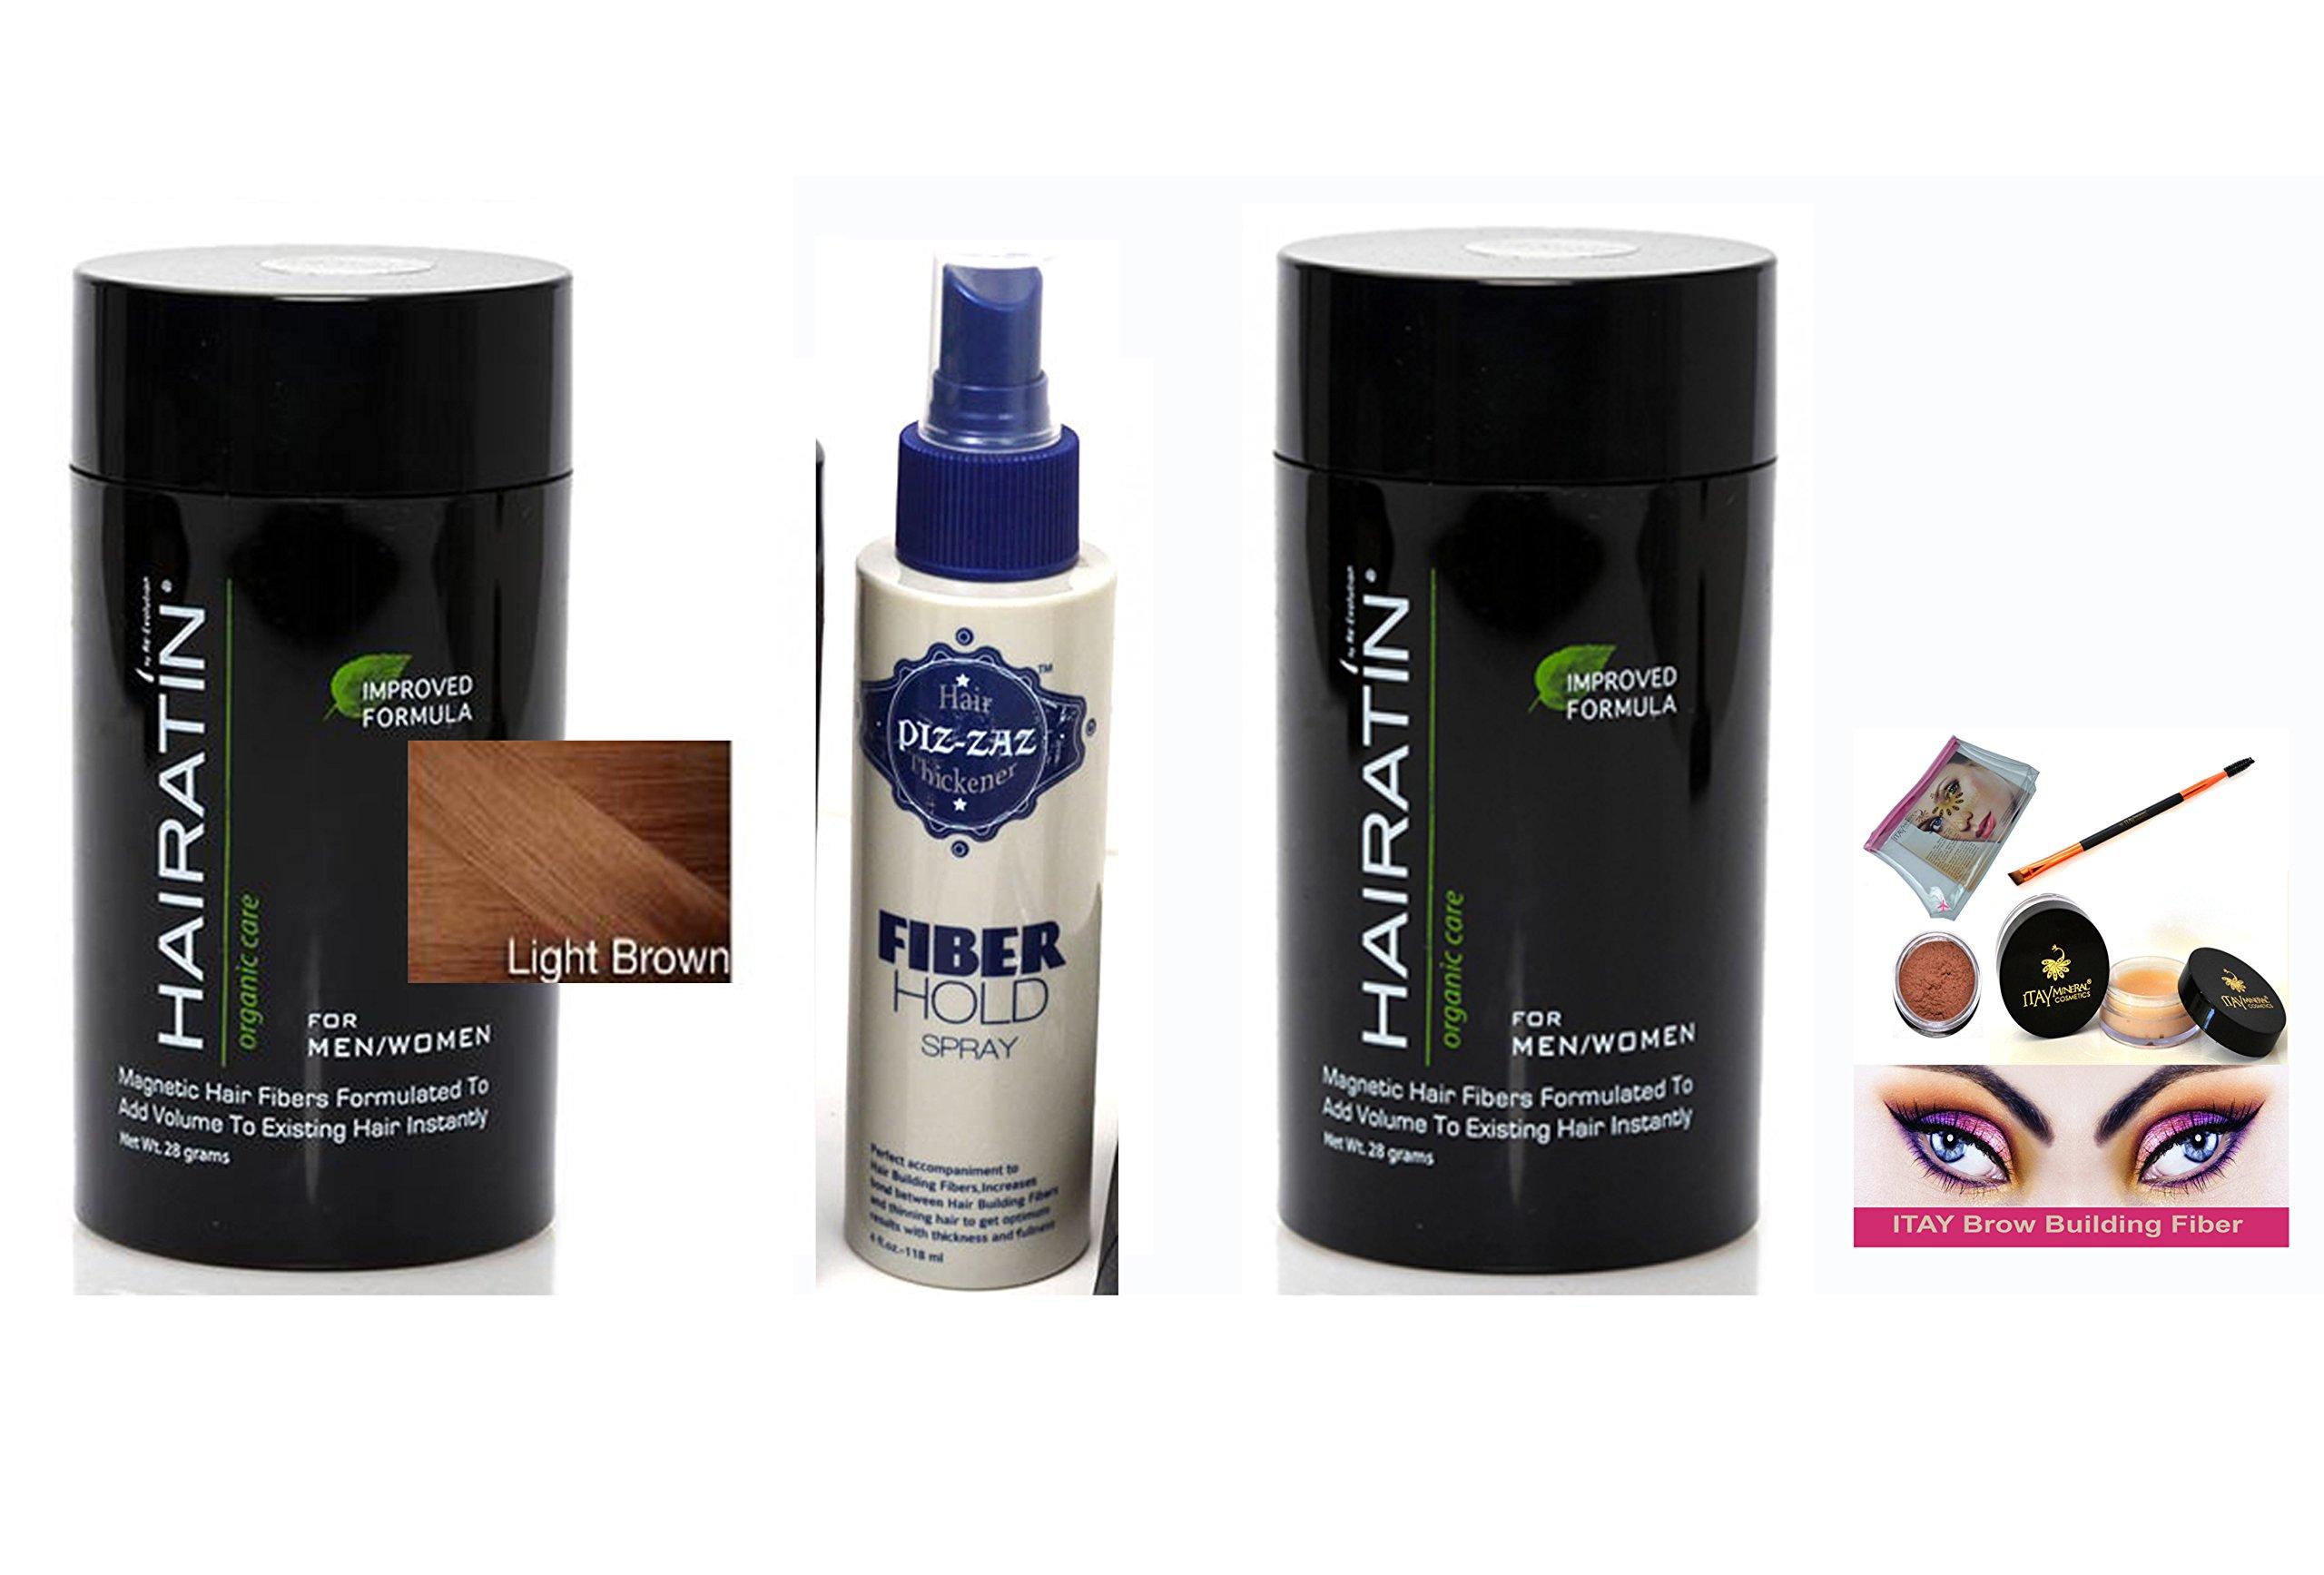 Bundle 4 Items: Hairatin 2x Hair Fibers Light Brown 28 gr +2x Hold Spray Piz-zaz + ITAY Brow Building Fiber kit matching color (light brown )